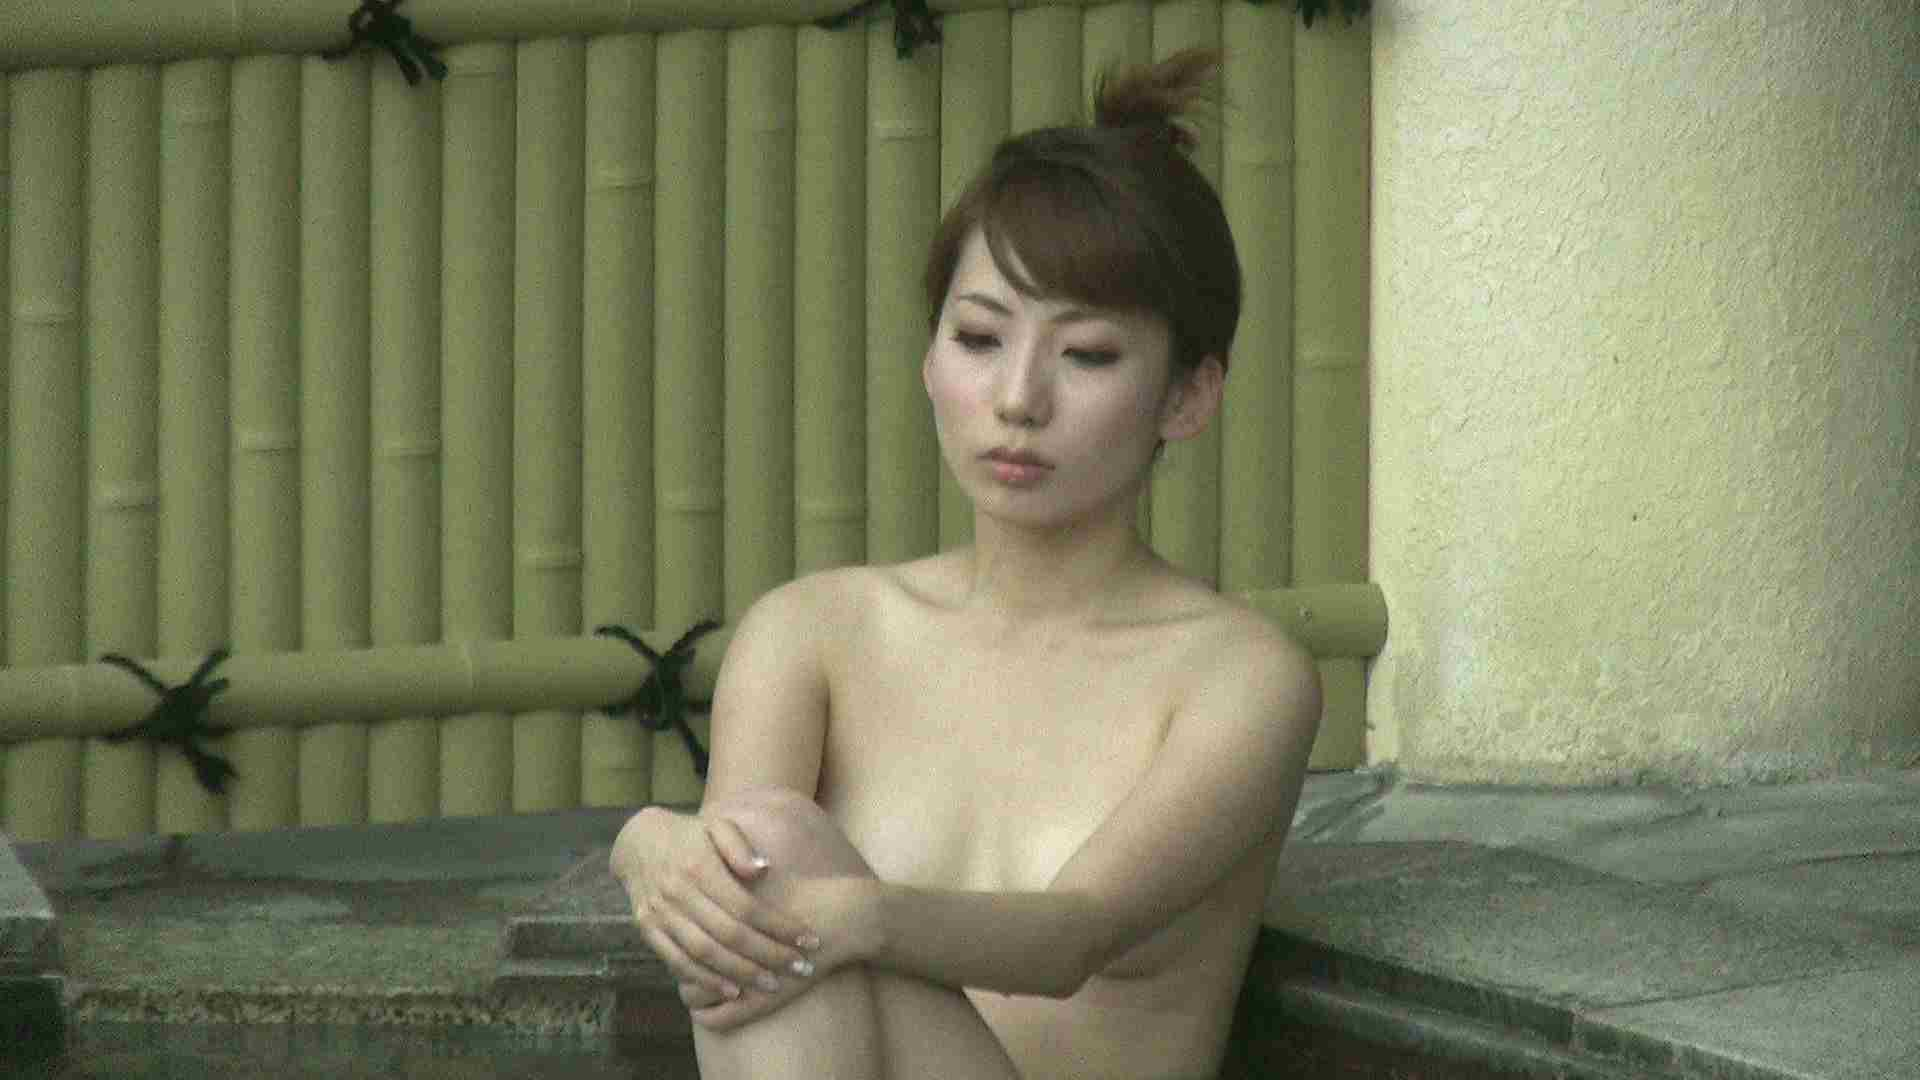 Aquaな露天風呂Vol.208 露天風呂編 | 盗撮シリーズ  103PIX 7